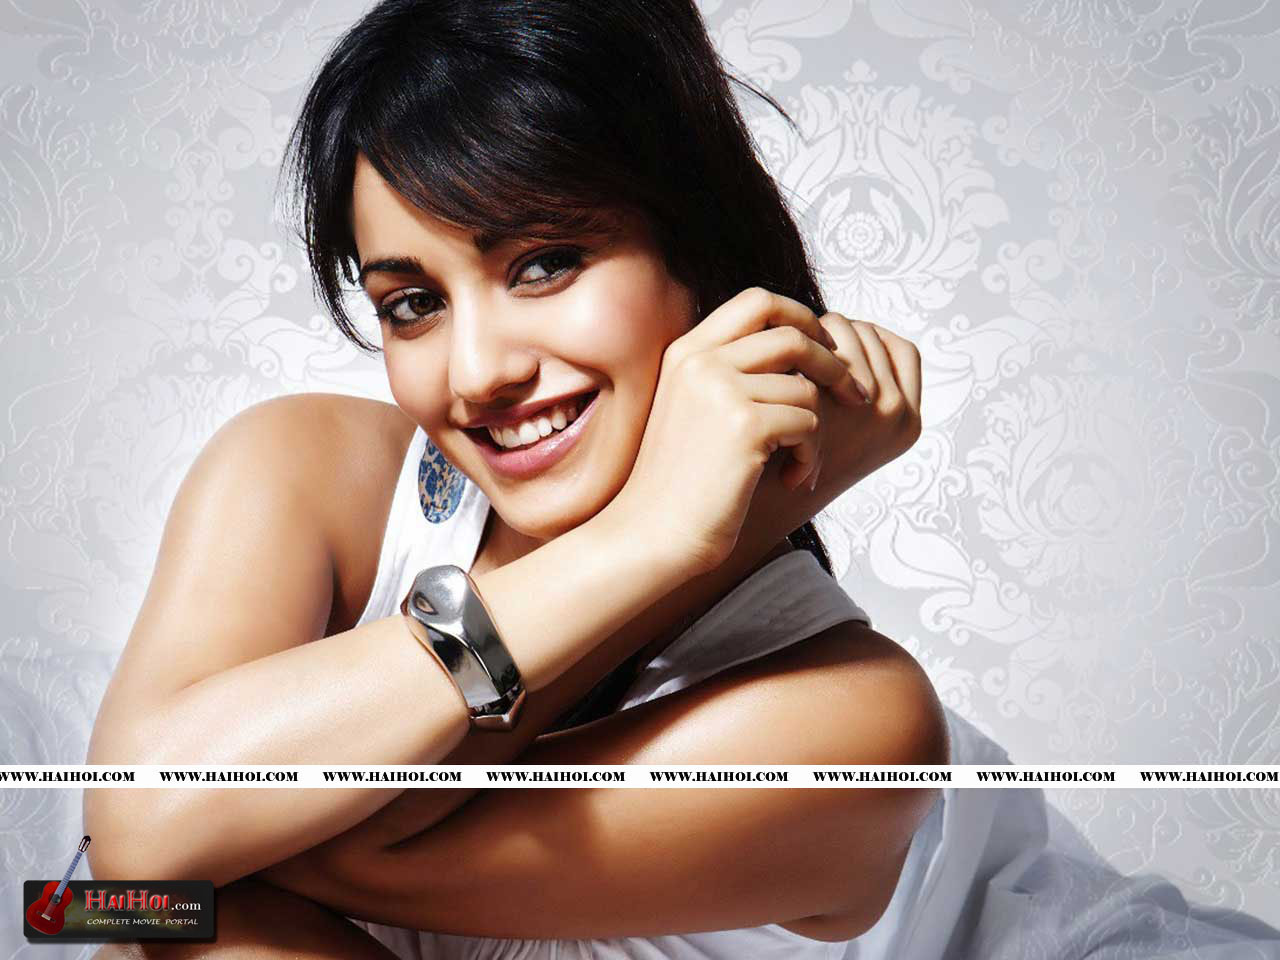 HD Wallpaper Of Neha Sharma